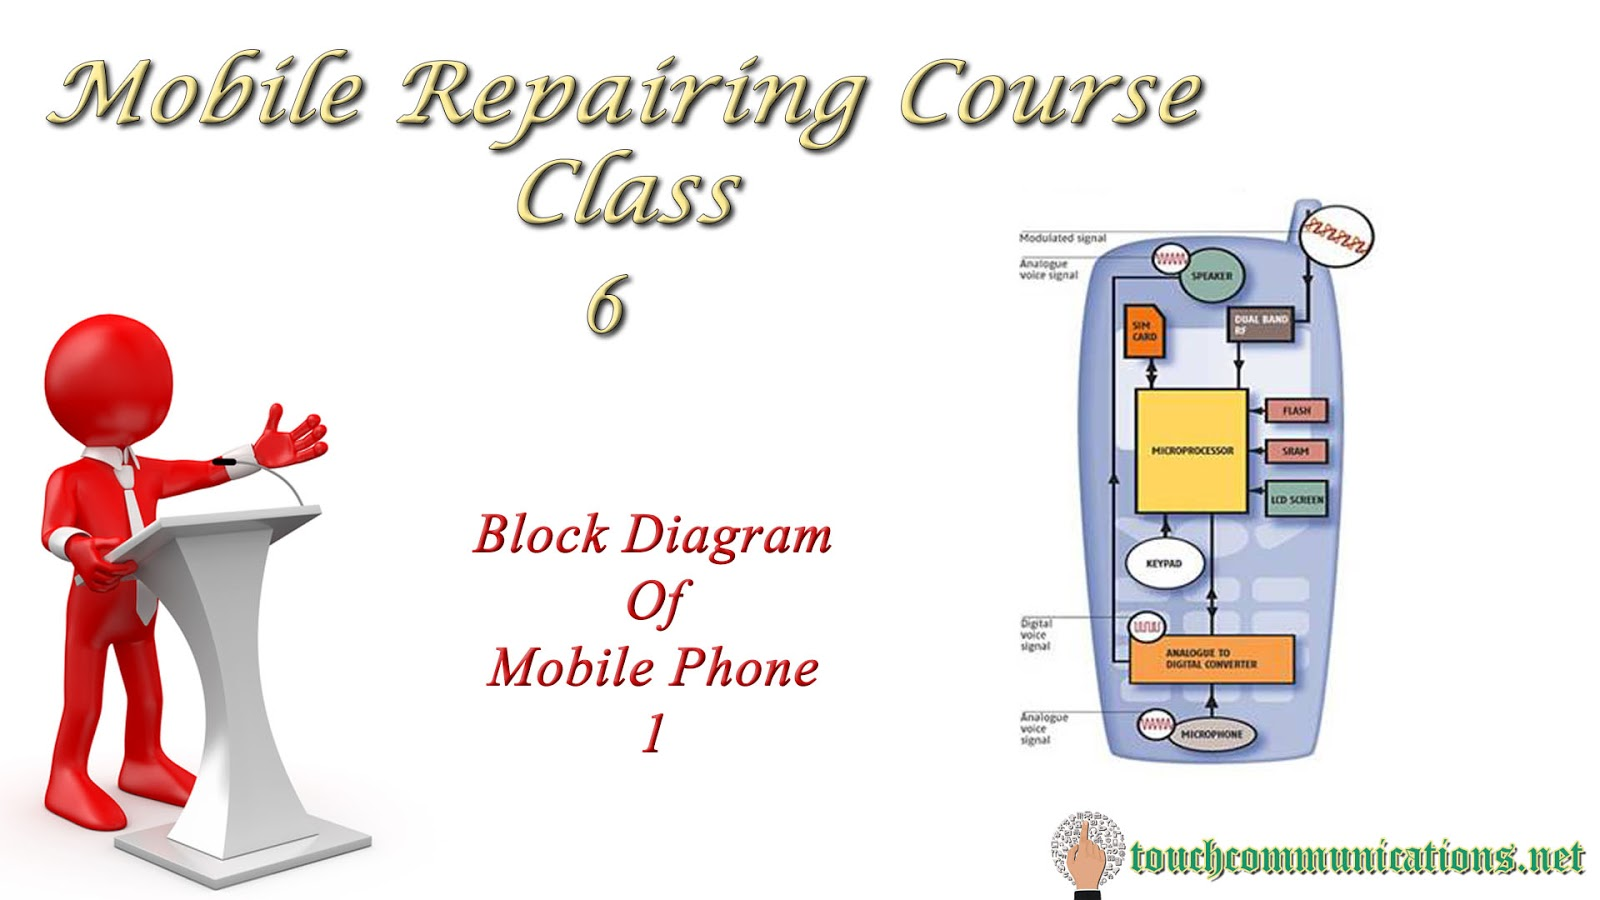 Mobile Repairing Course Online Free Class 6 Block Diagram Of Mobile ...